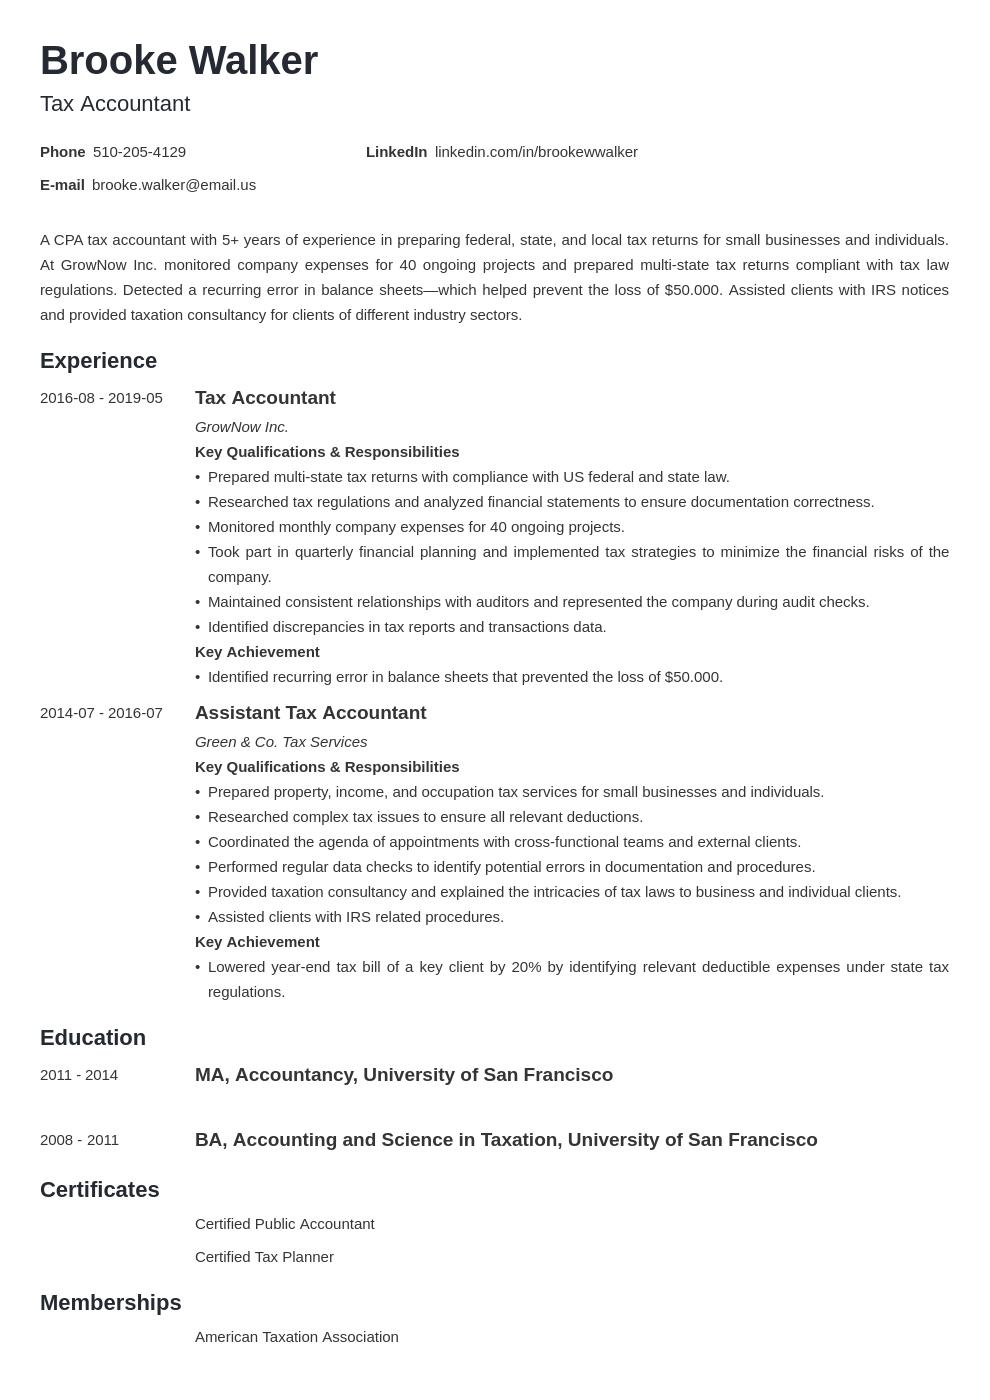 Tax Accountant Resume Example Template Minimo Accountant Resume Resume Examples Job Resume Examples